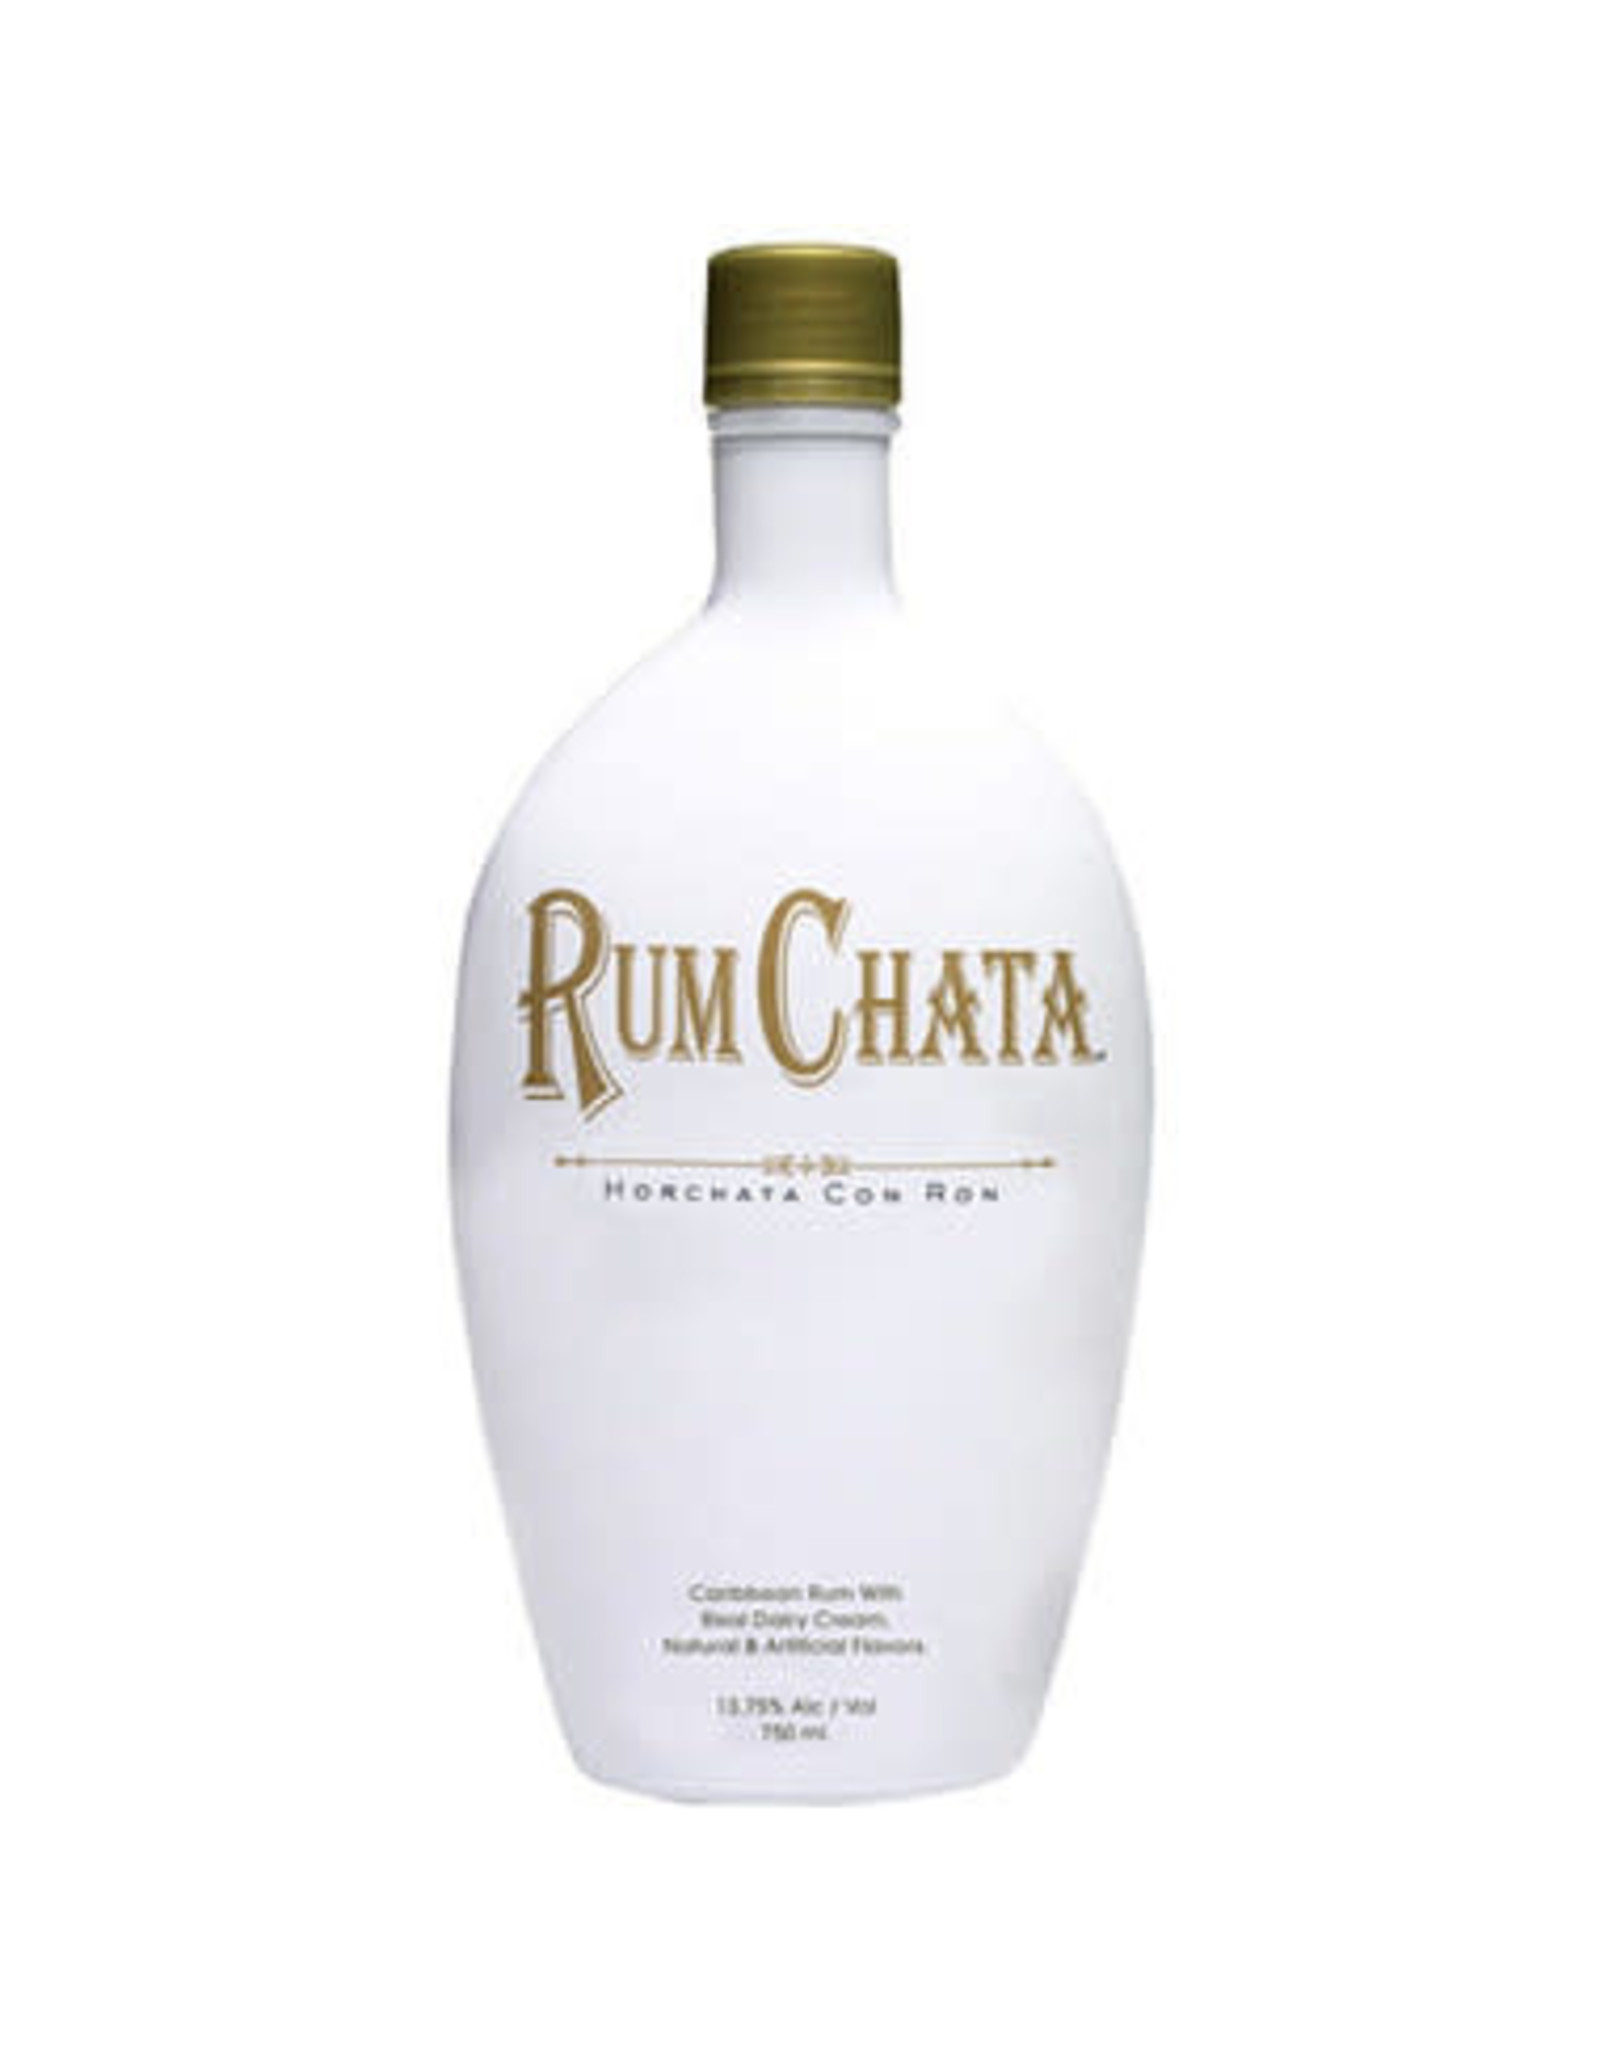 RUM CHATA 1.75